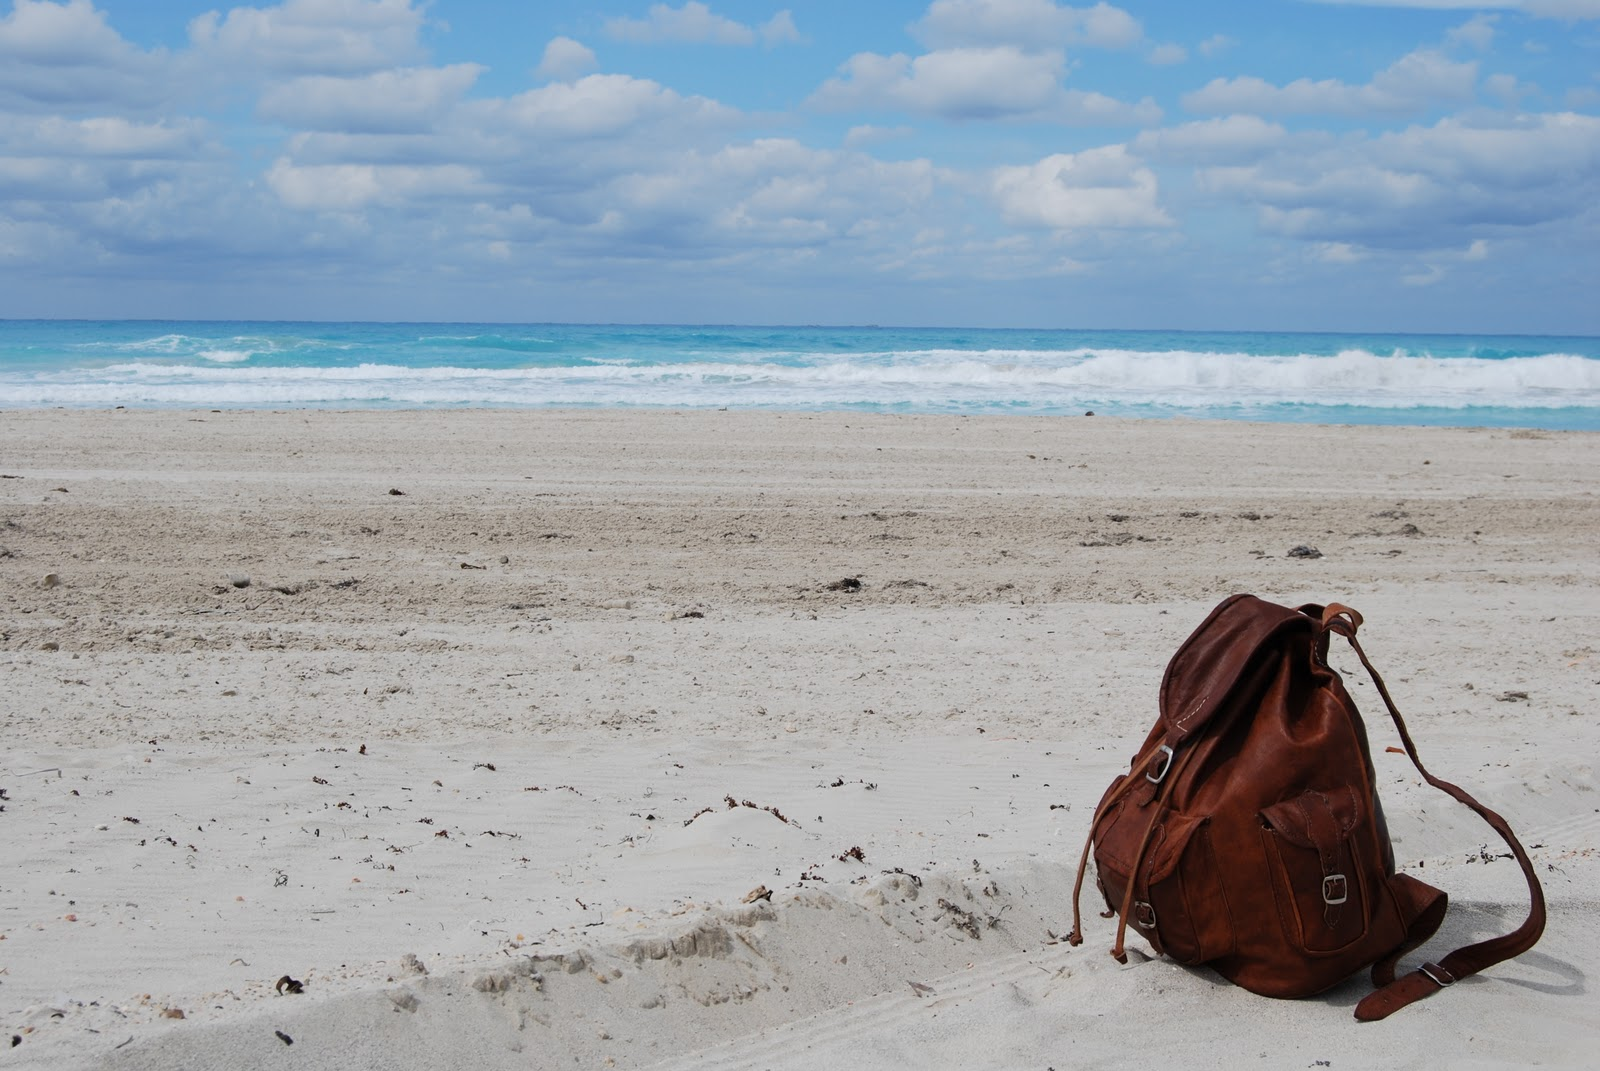 http://4.bp.blogspot.com/-b7CJQKzGRQg/TqLh1T1LrPI/AAAAAAAAEKQ/XDhn-tlWbAc/s1600/Beach.jpg